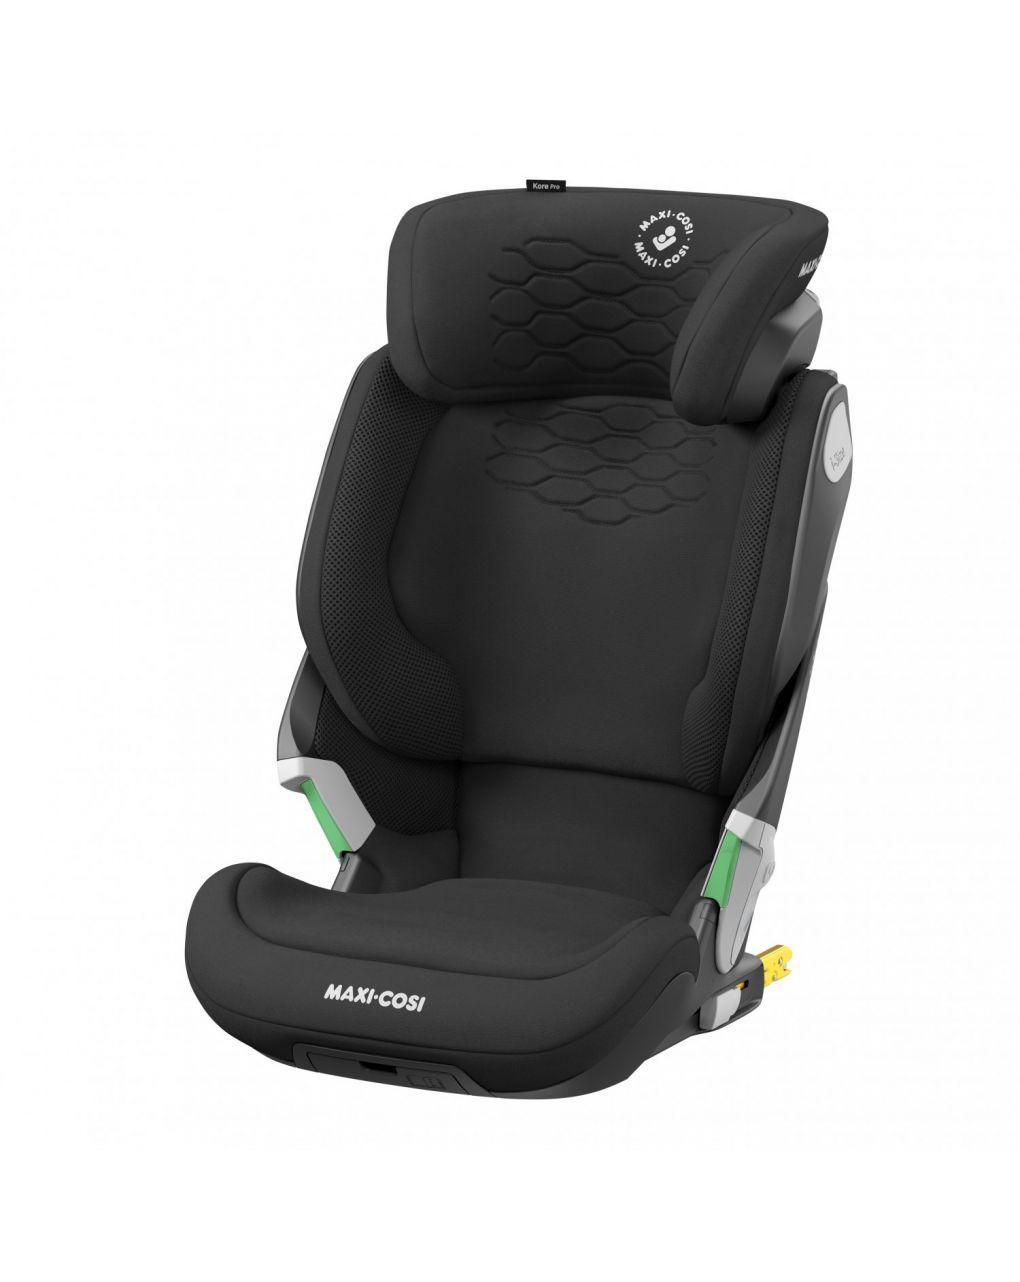 Maxi Cosi Κάθισμα Αυτοκινήτου Kore Pro i-Size, Authentic Black